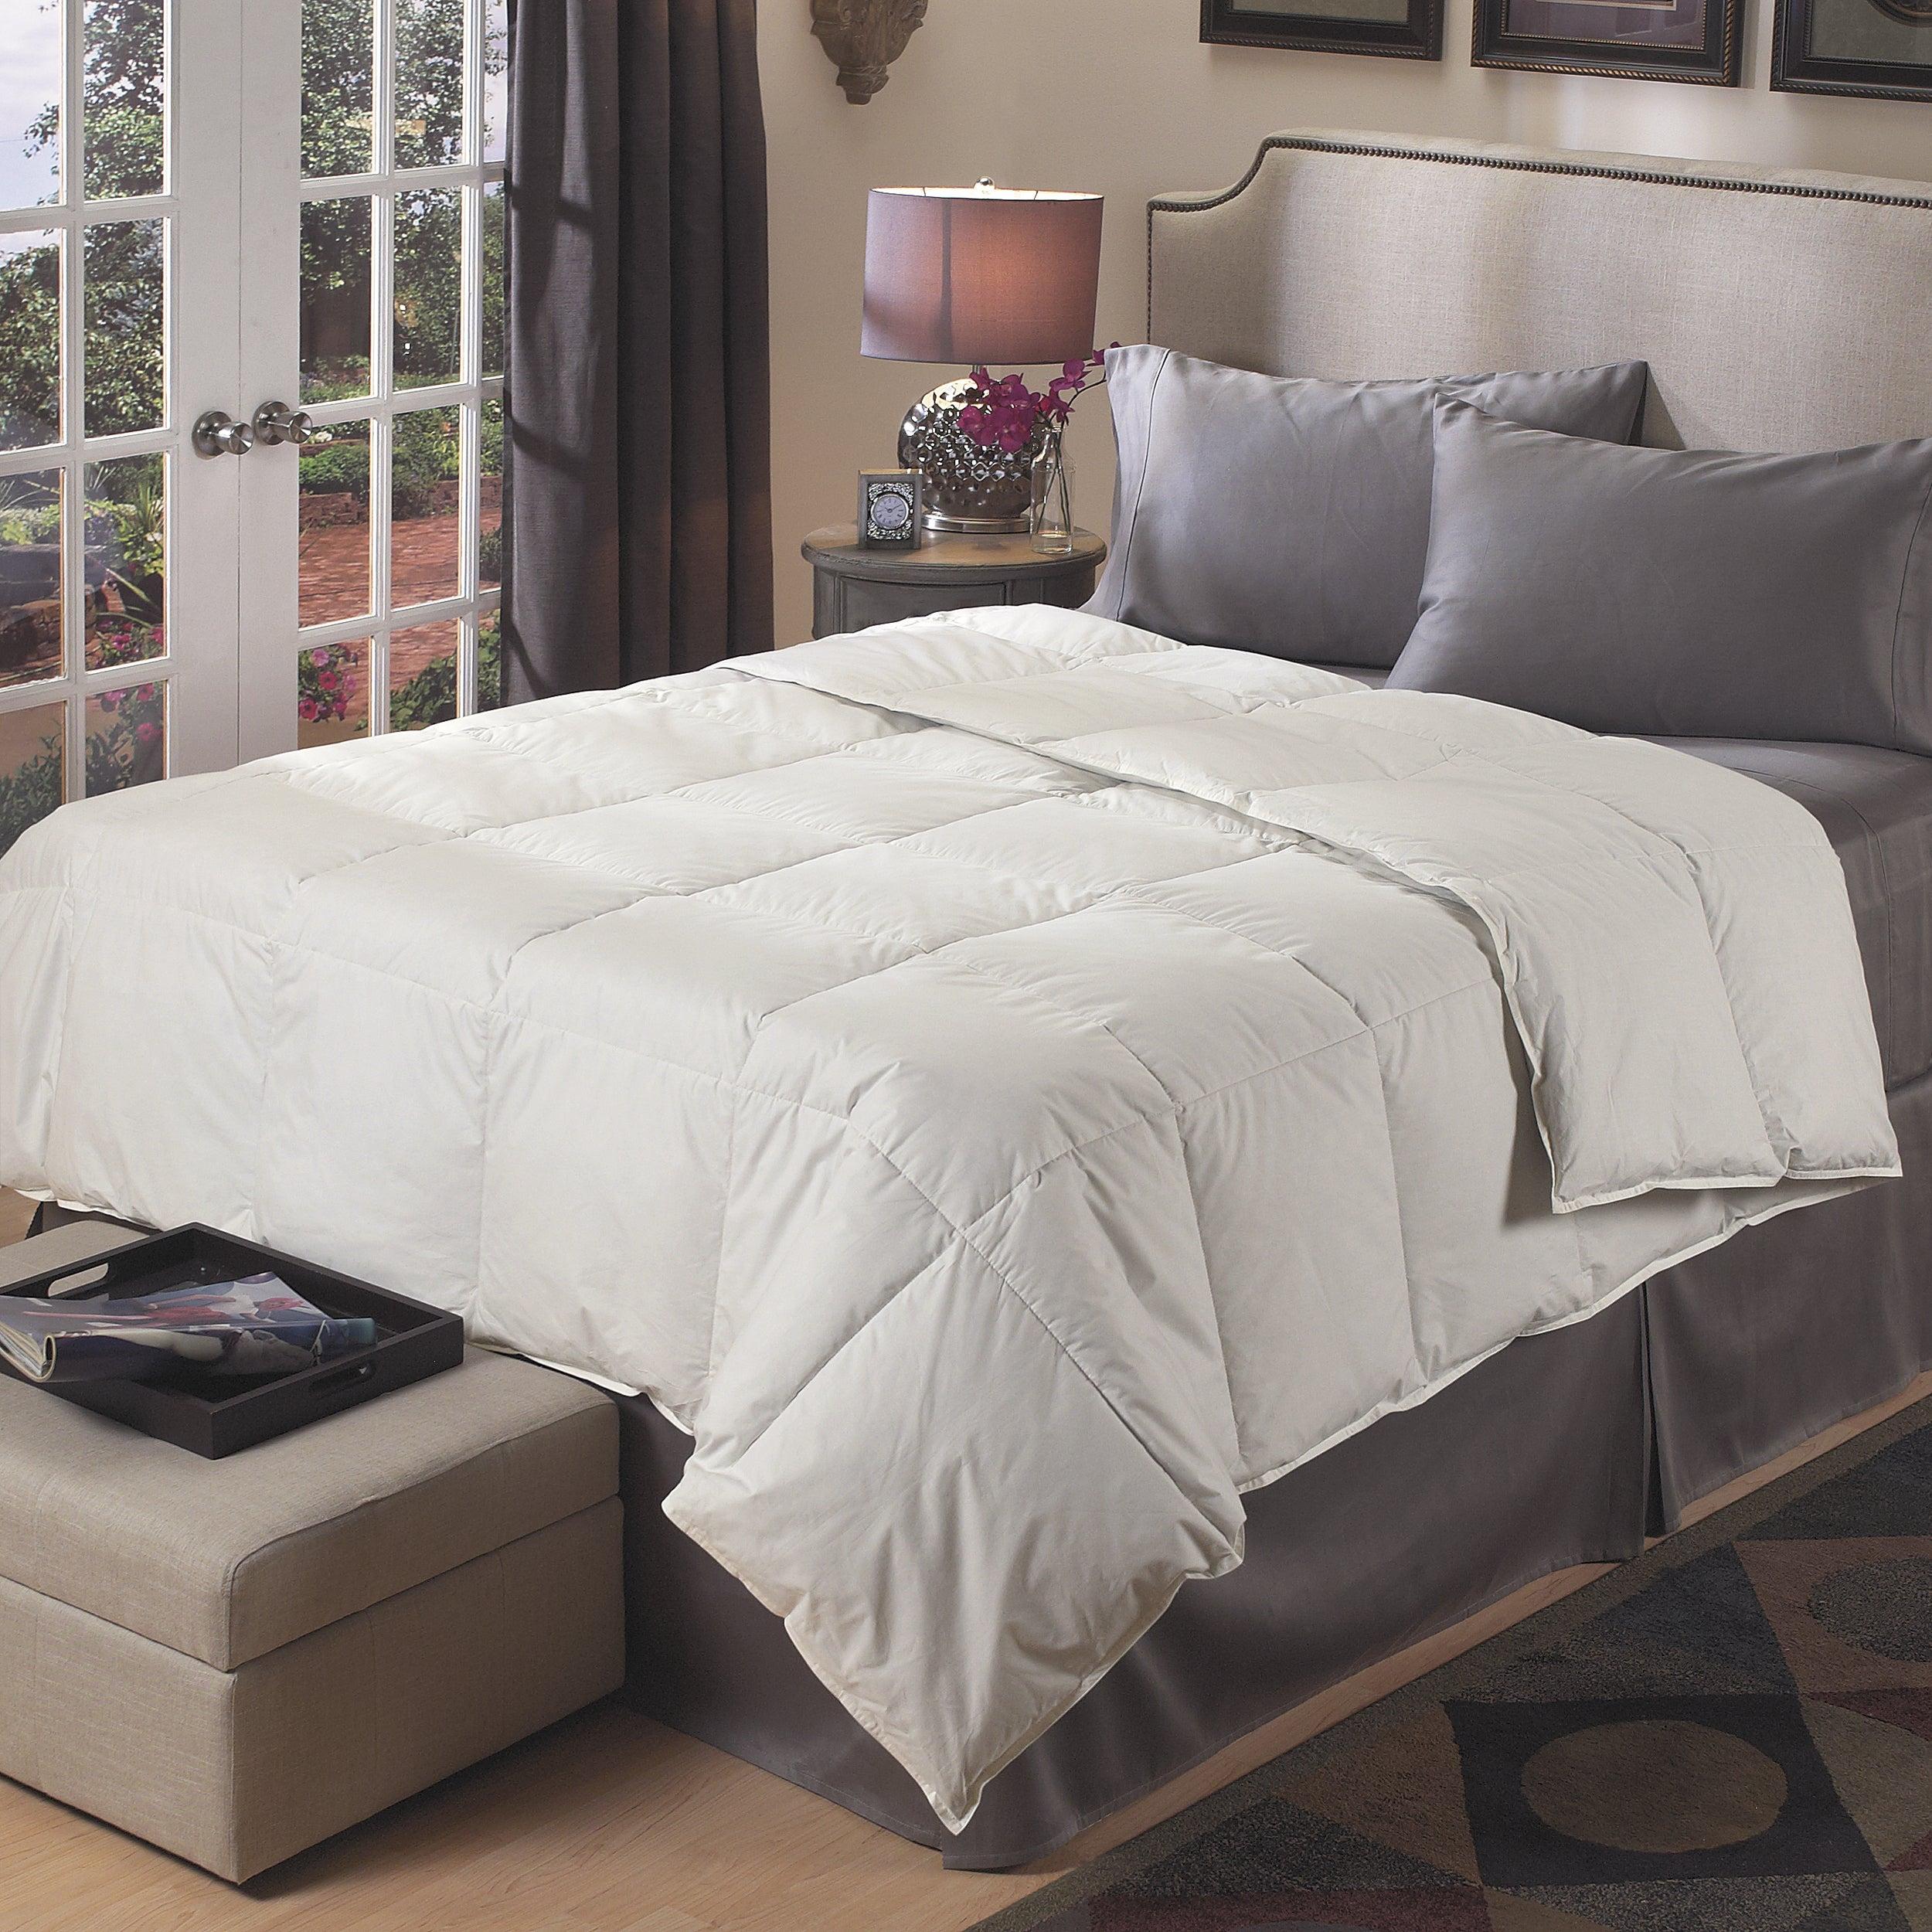 Joseph Abboud Classic Performance Down-like Comforter